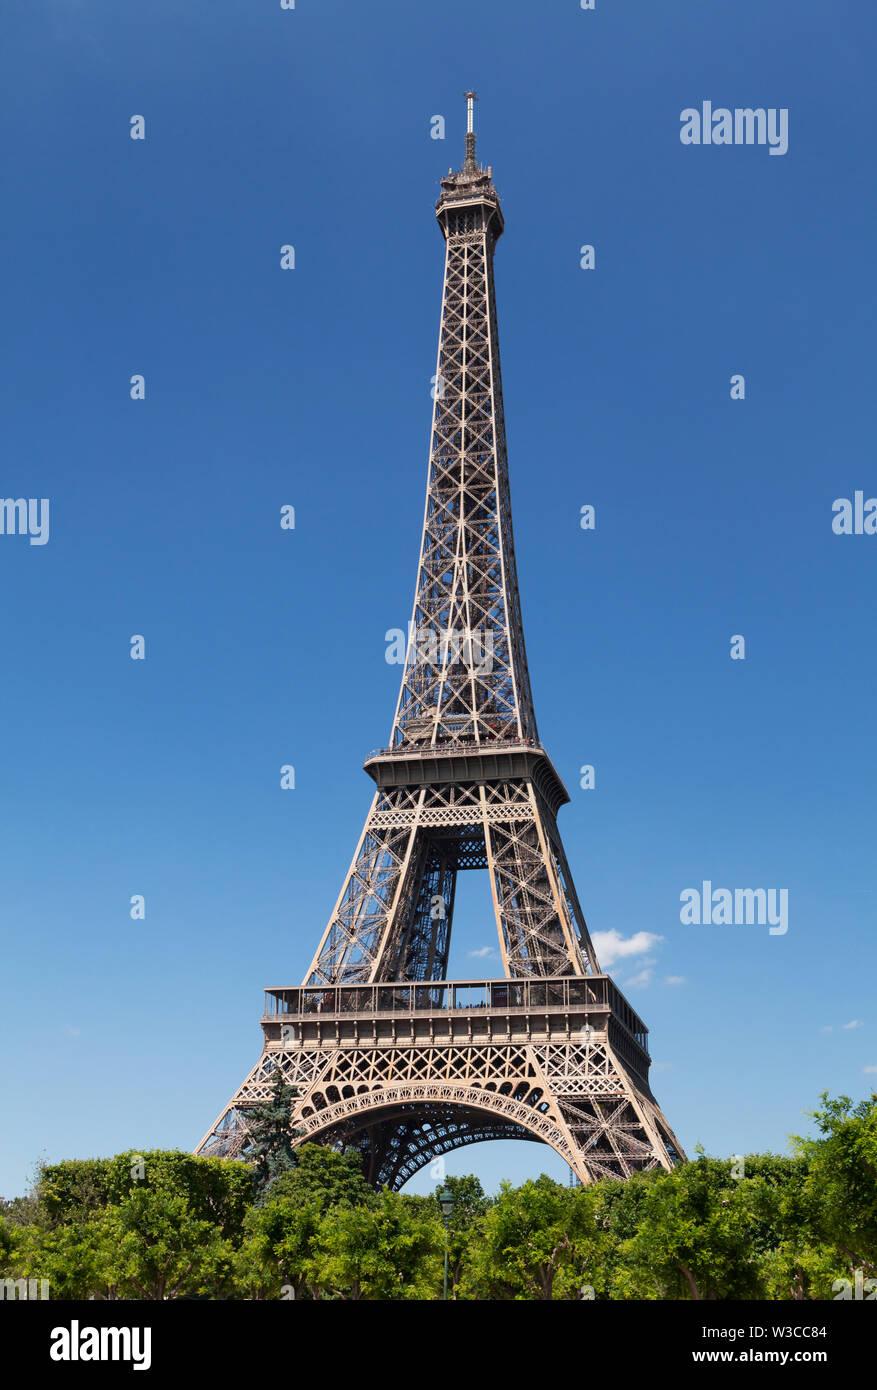 Eiffel tower, Paris. France. Tourist greeting card - Stock Image